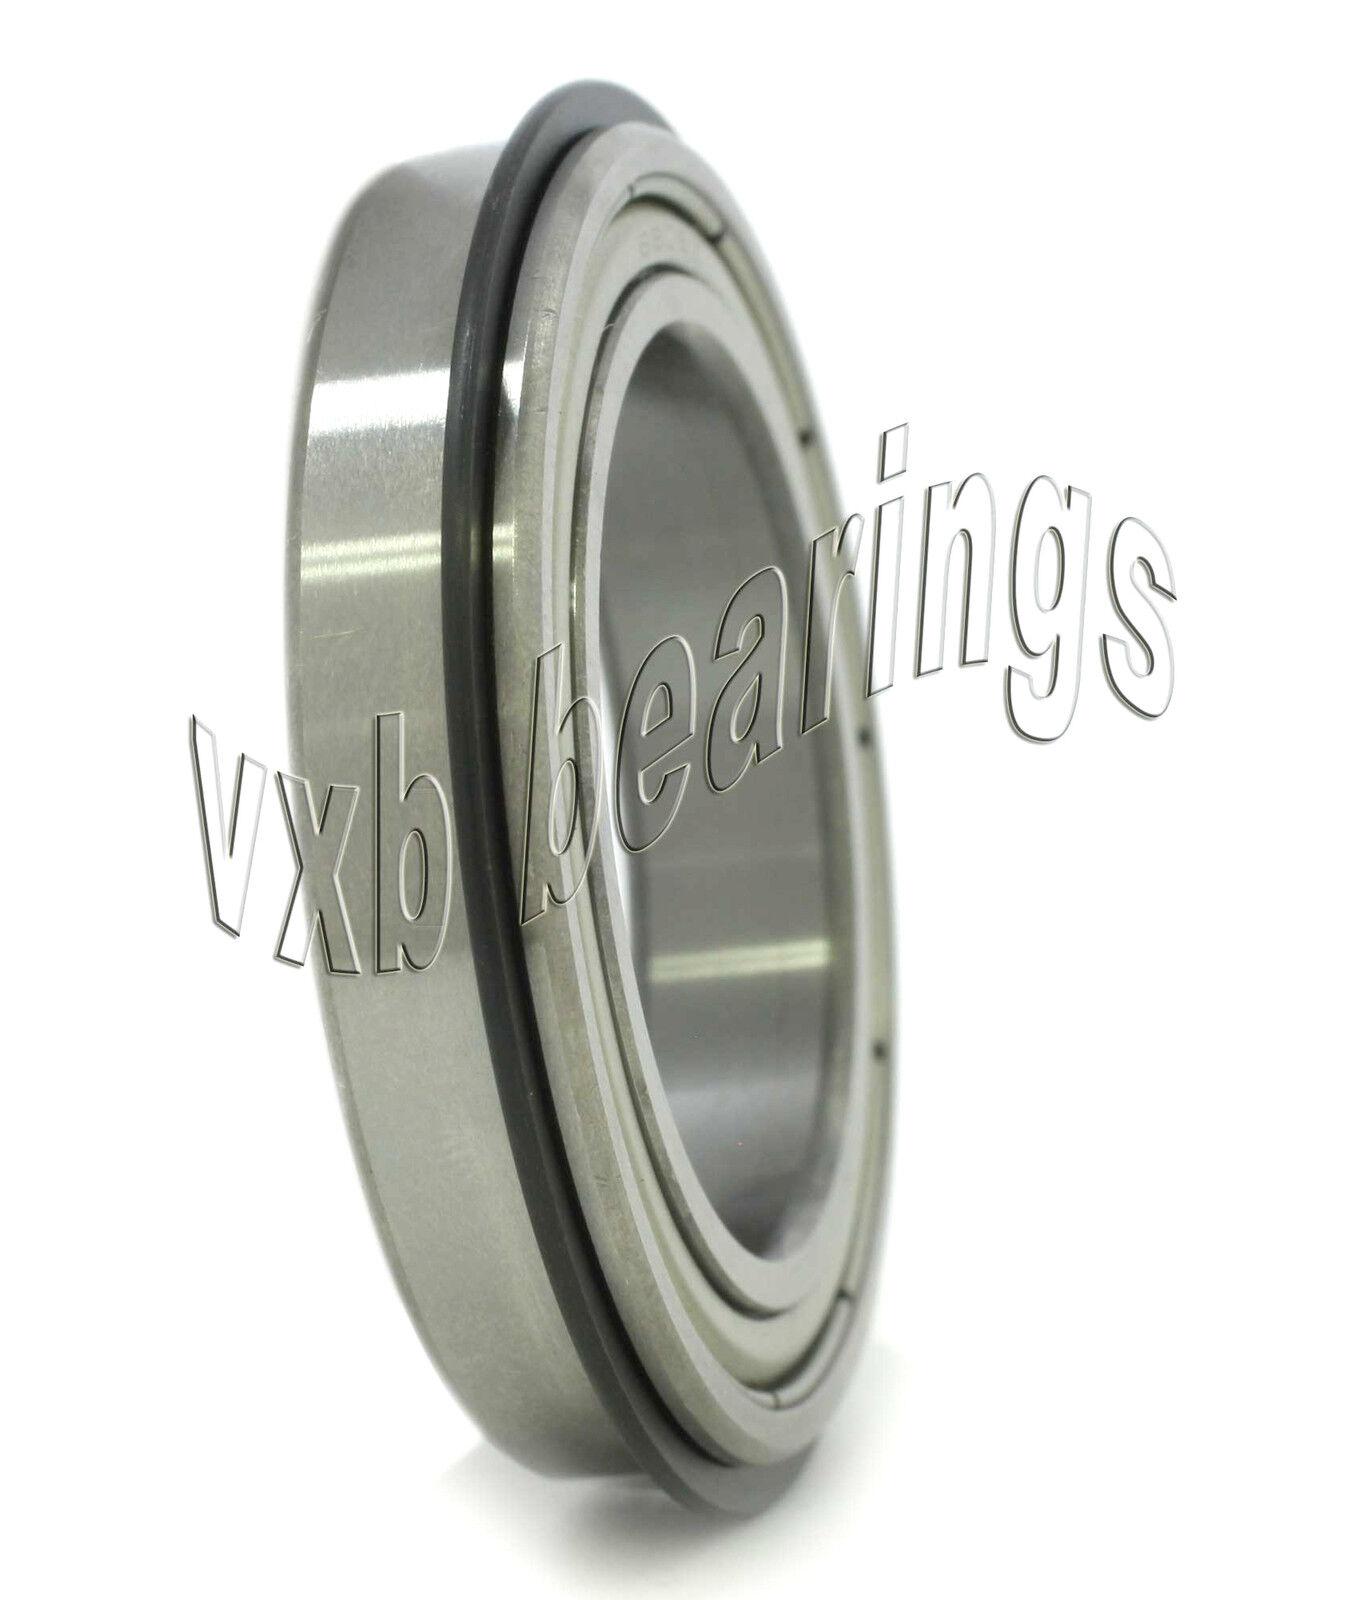 688ZZNR Shielded Bearing Snap Ring  8x16x5 Ball Bearings